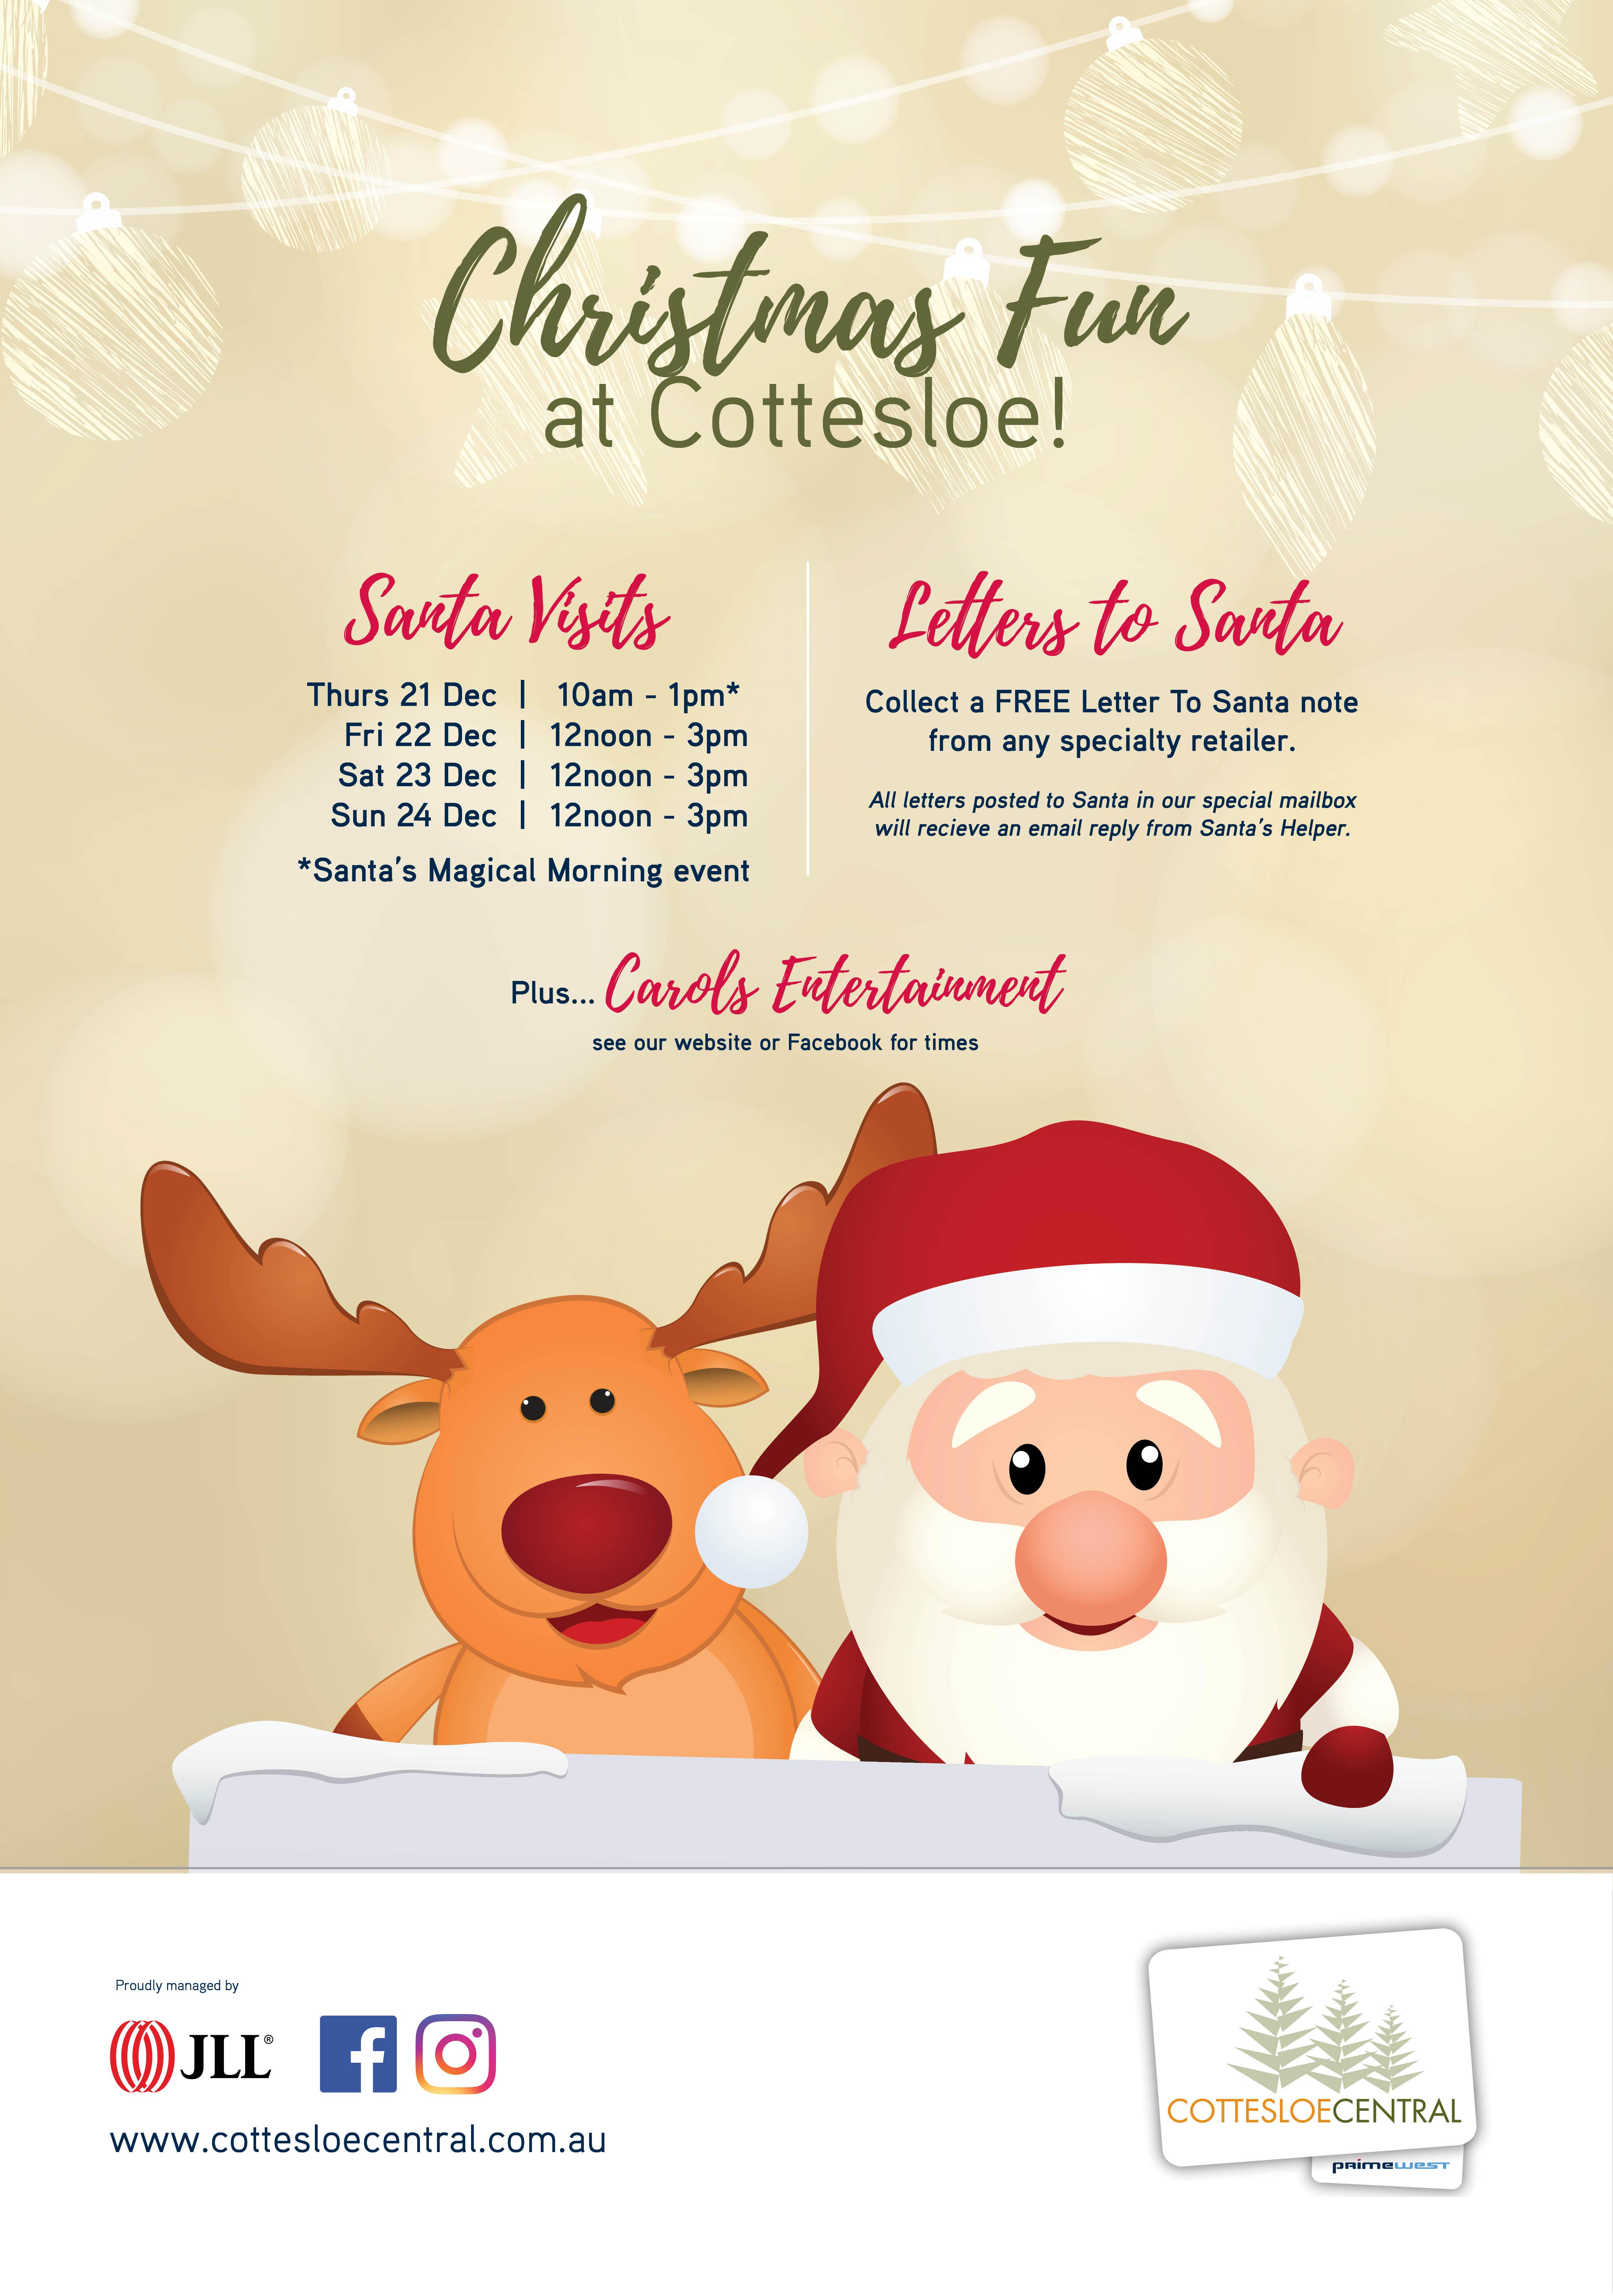 Christmas fun at cottesloe central cottesloe central santa visits spiritdancerdesigns Gallery